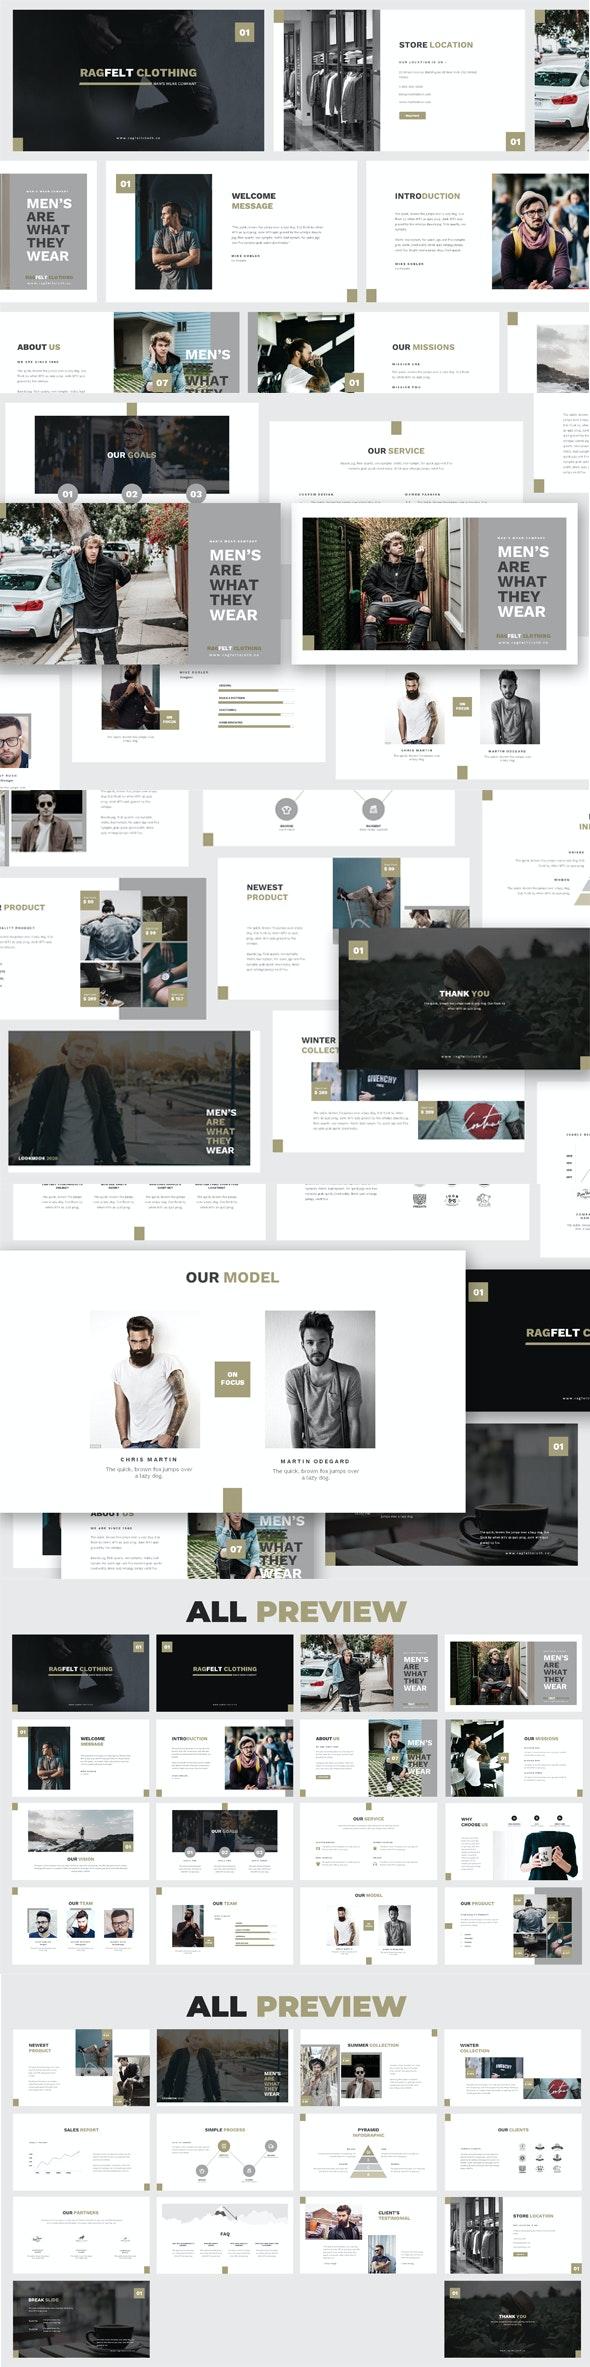 Man Fashion Powerpoint Template - PowerPoint Templates Presentation Templates